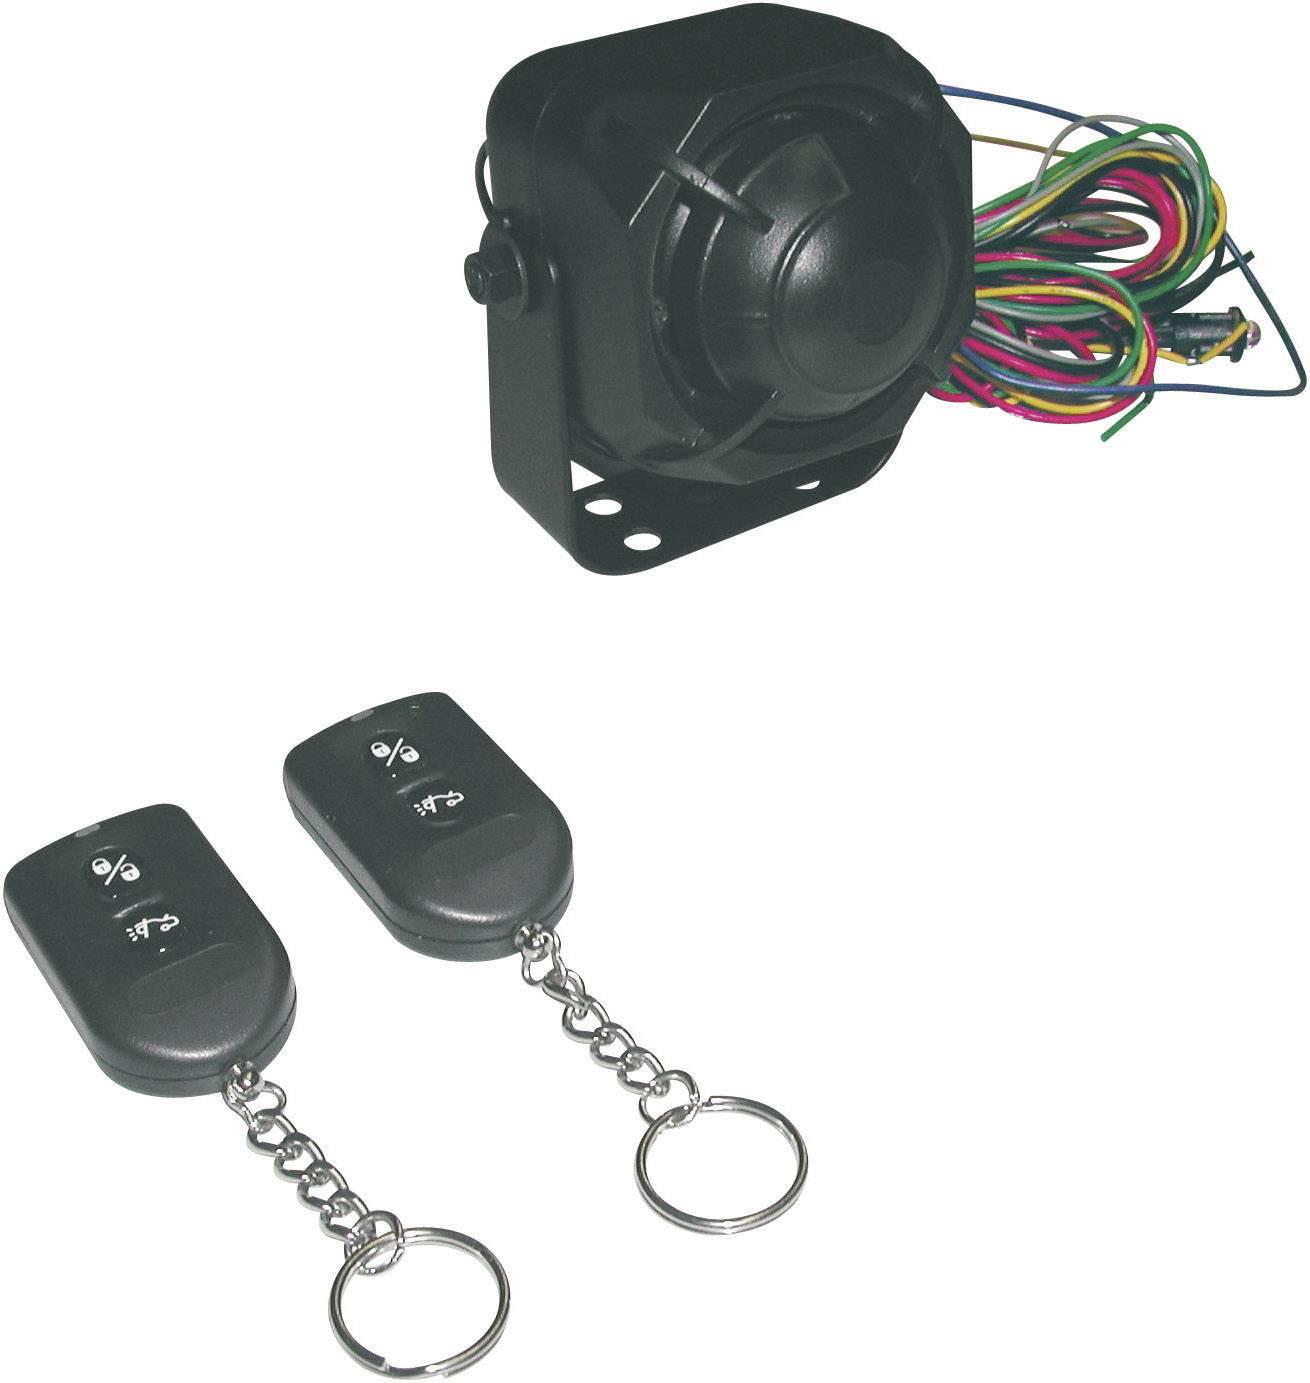 Alarm do auta Waeco KOMPAKT-ALARMANLAGE STANDARD DIY-12, 12 V